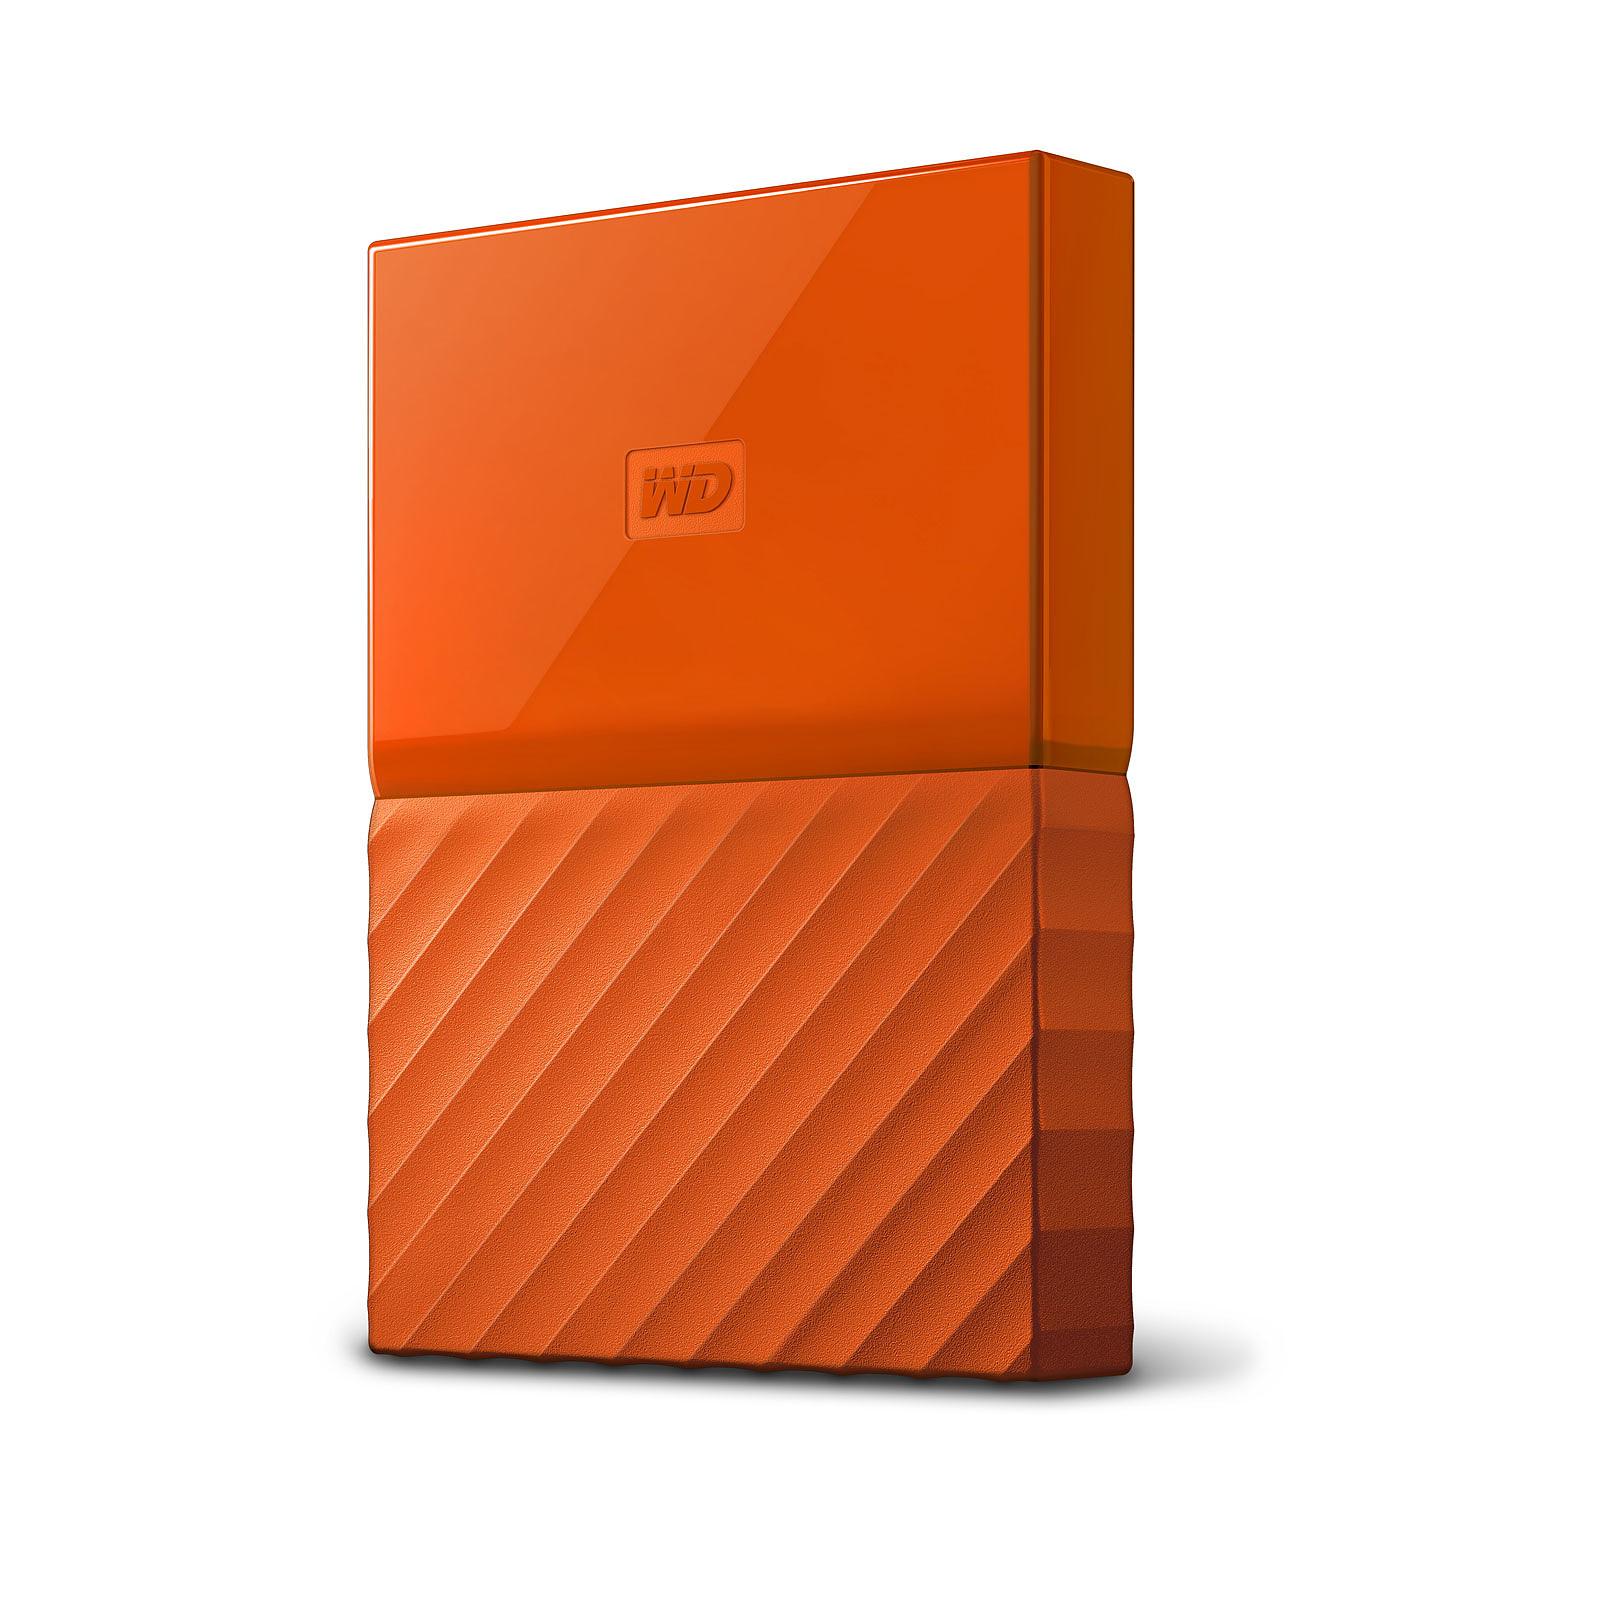 WD My Passport 1 To Orange (USB 3.0)